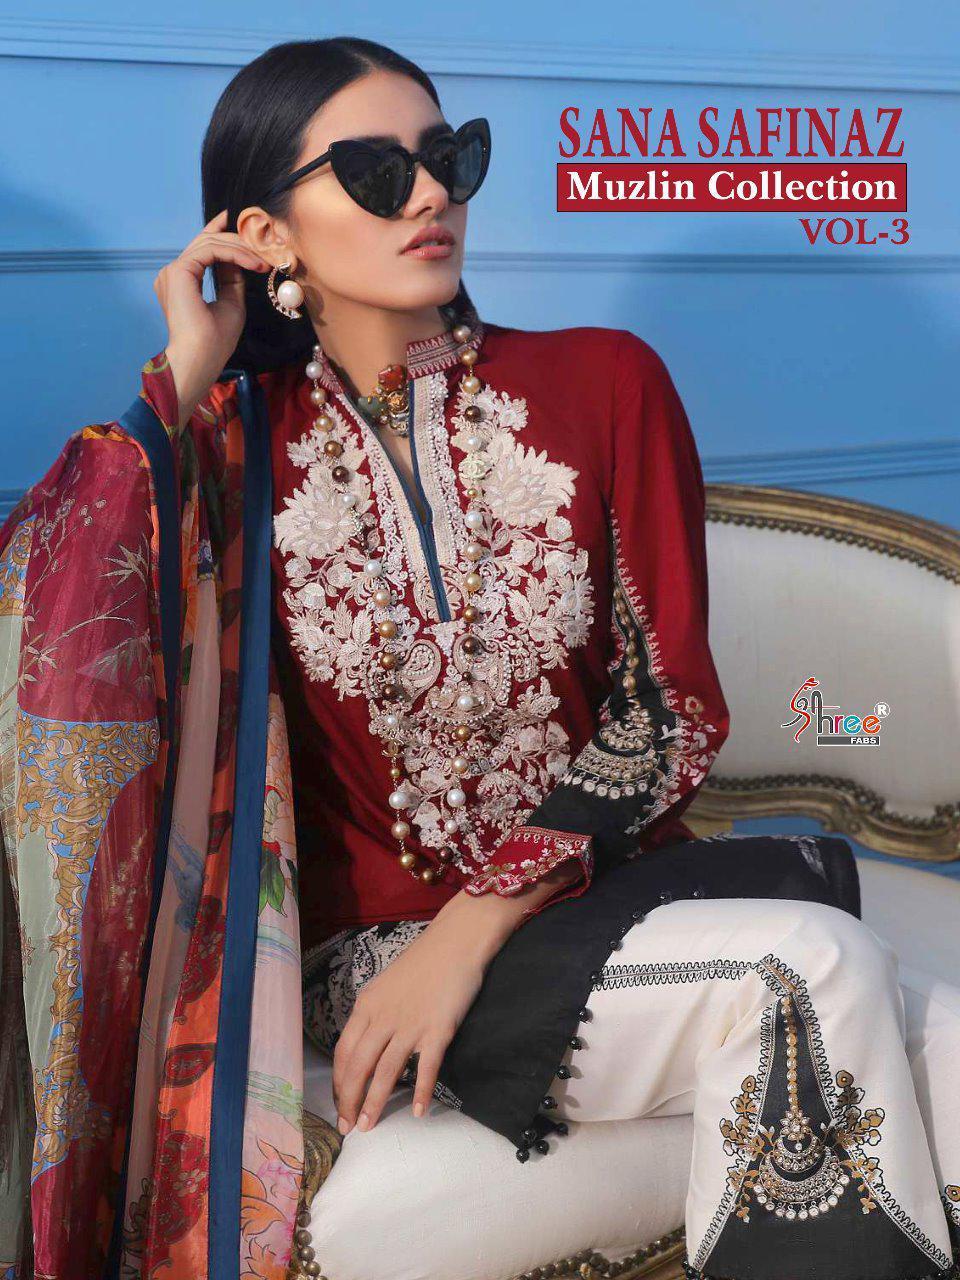 584aae0268 Shree fab Sana Safinaz Muzlin Collection vol 3 Pakistani Suits ...